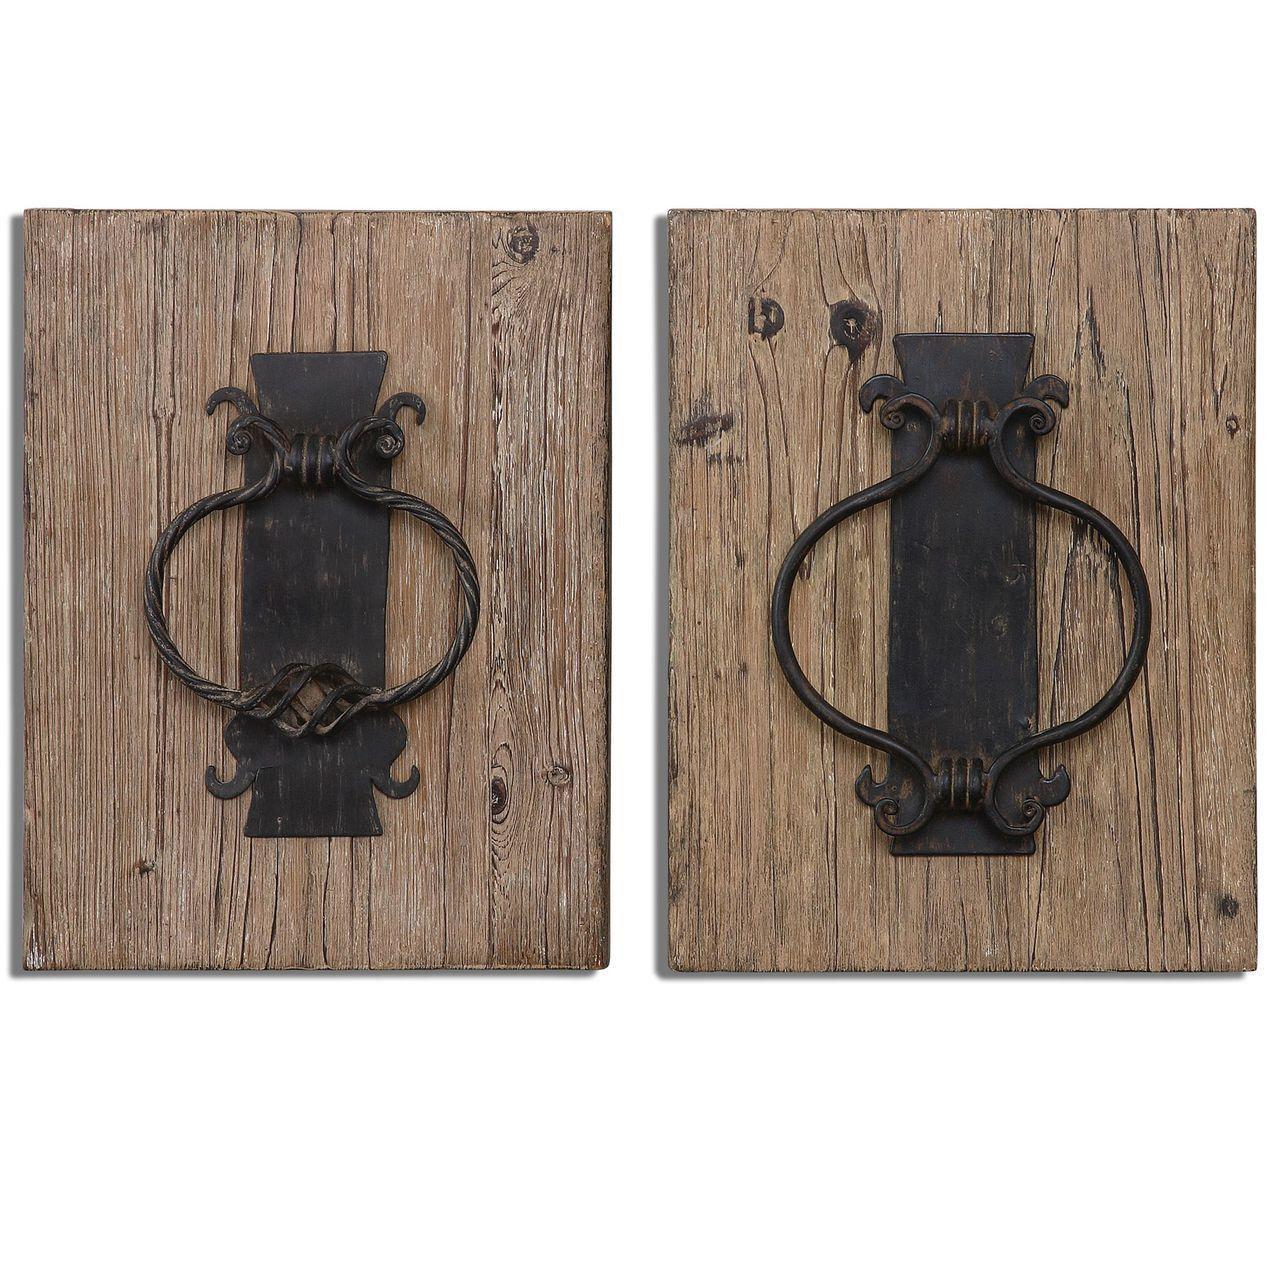 Uttermost rustic door knockers wall art s products pinterest